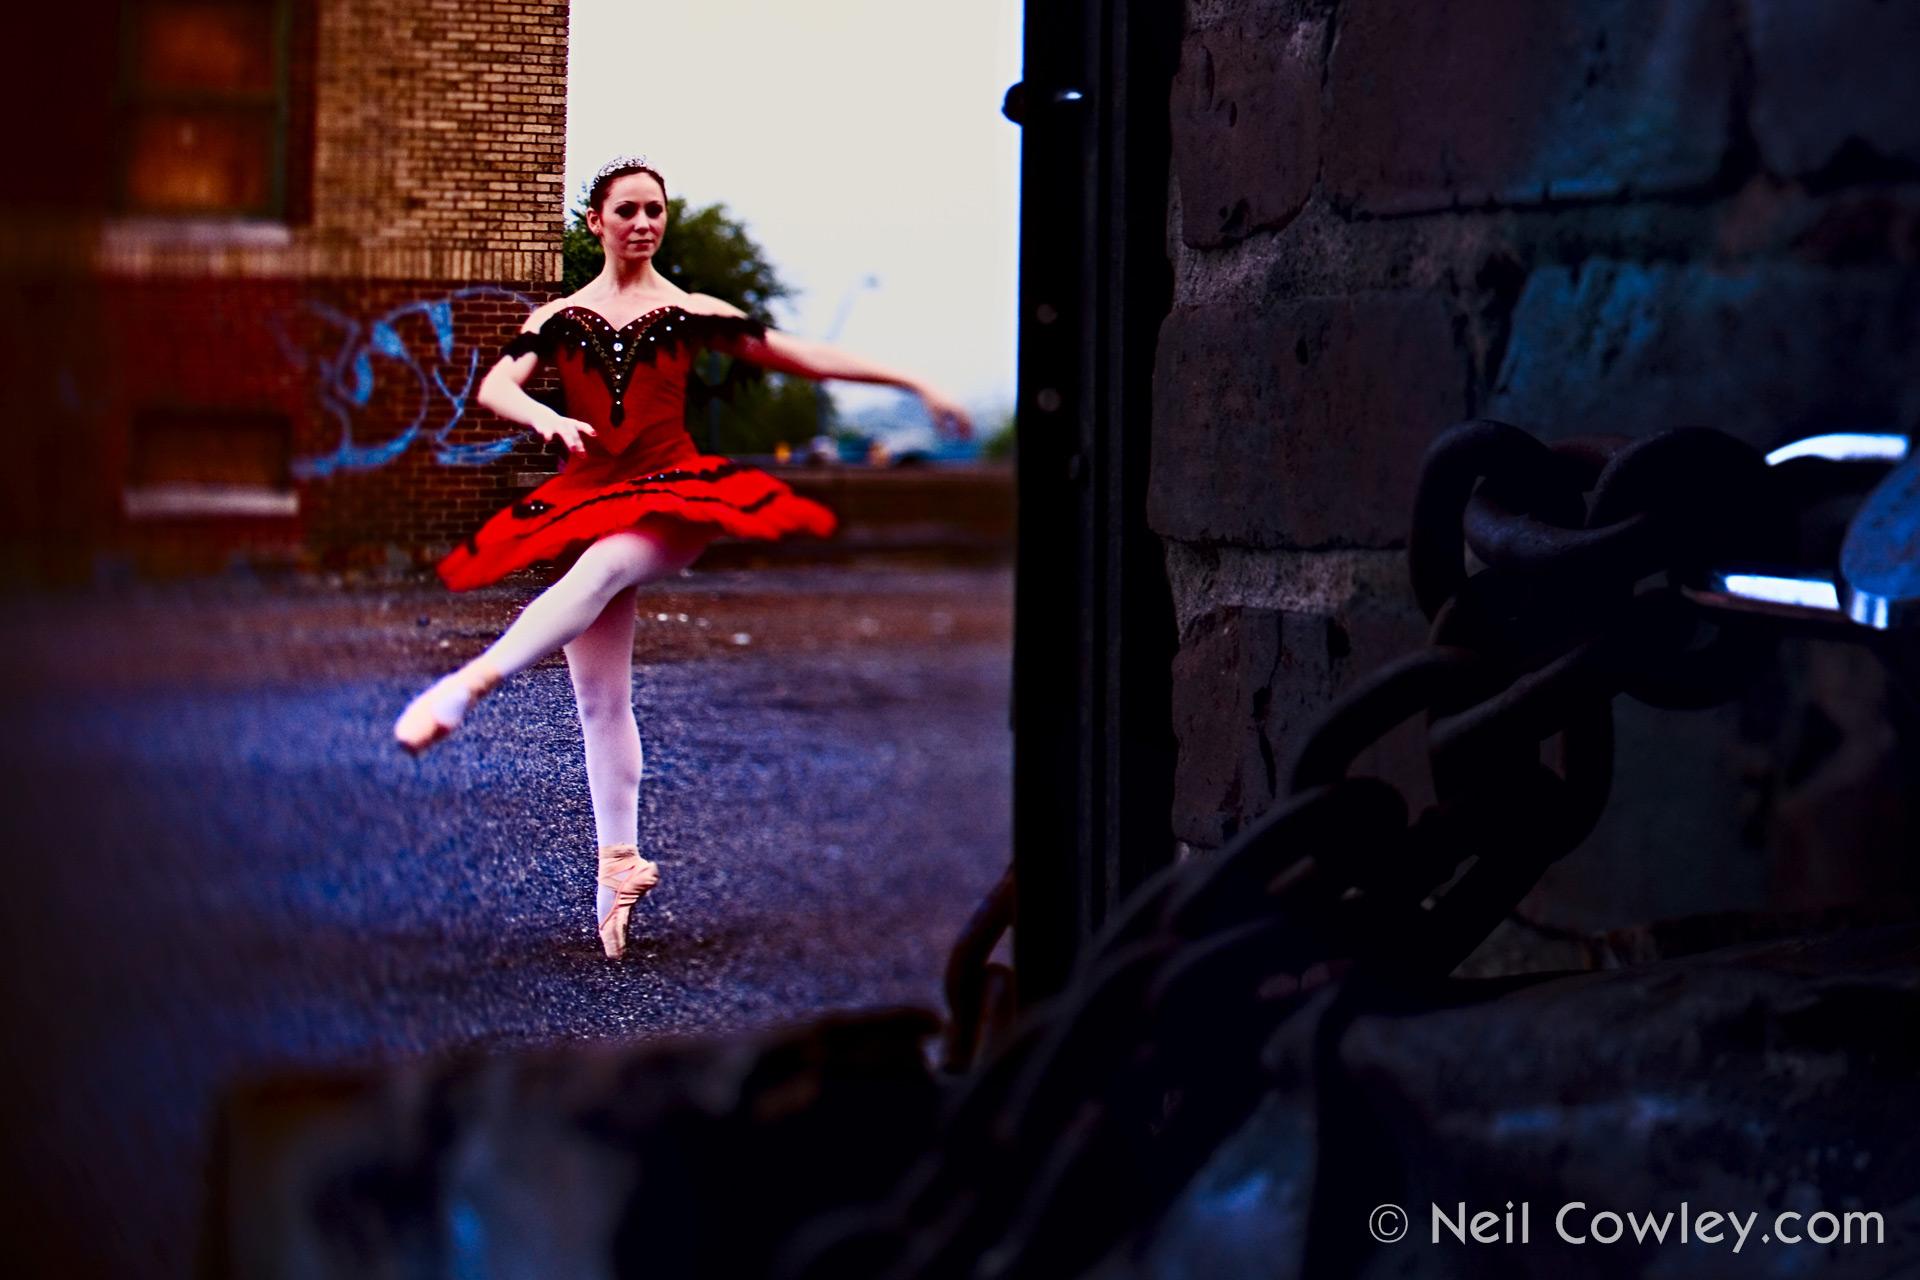 peoria-commercial-photographer-0137